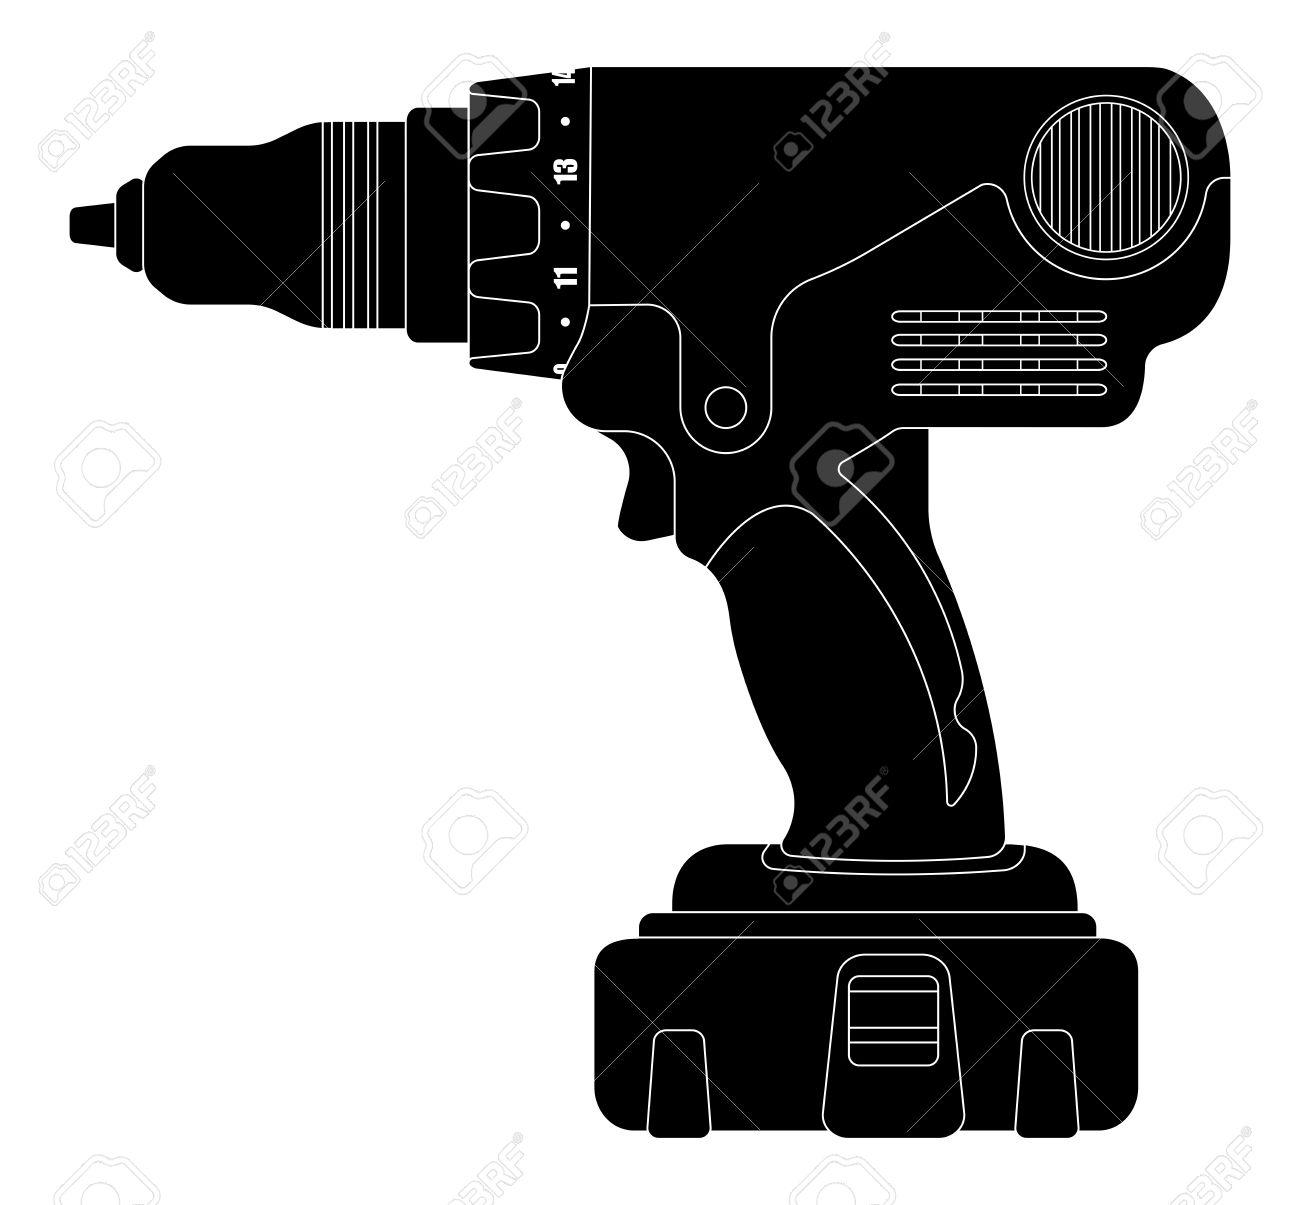 Electric Cordless Hand Drill Icon In Black Color. Clip Art Vector.